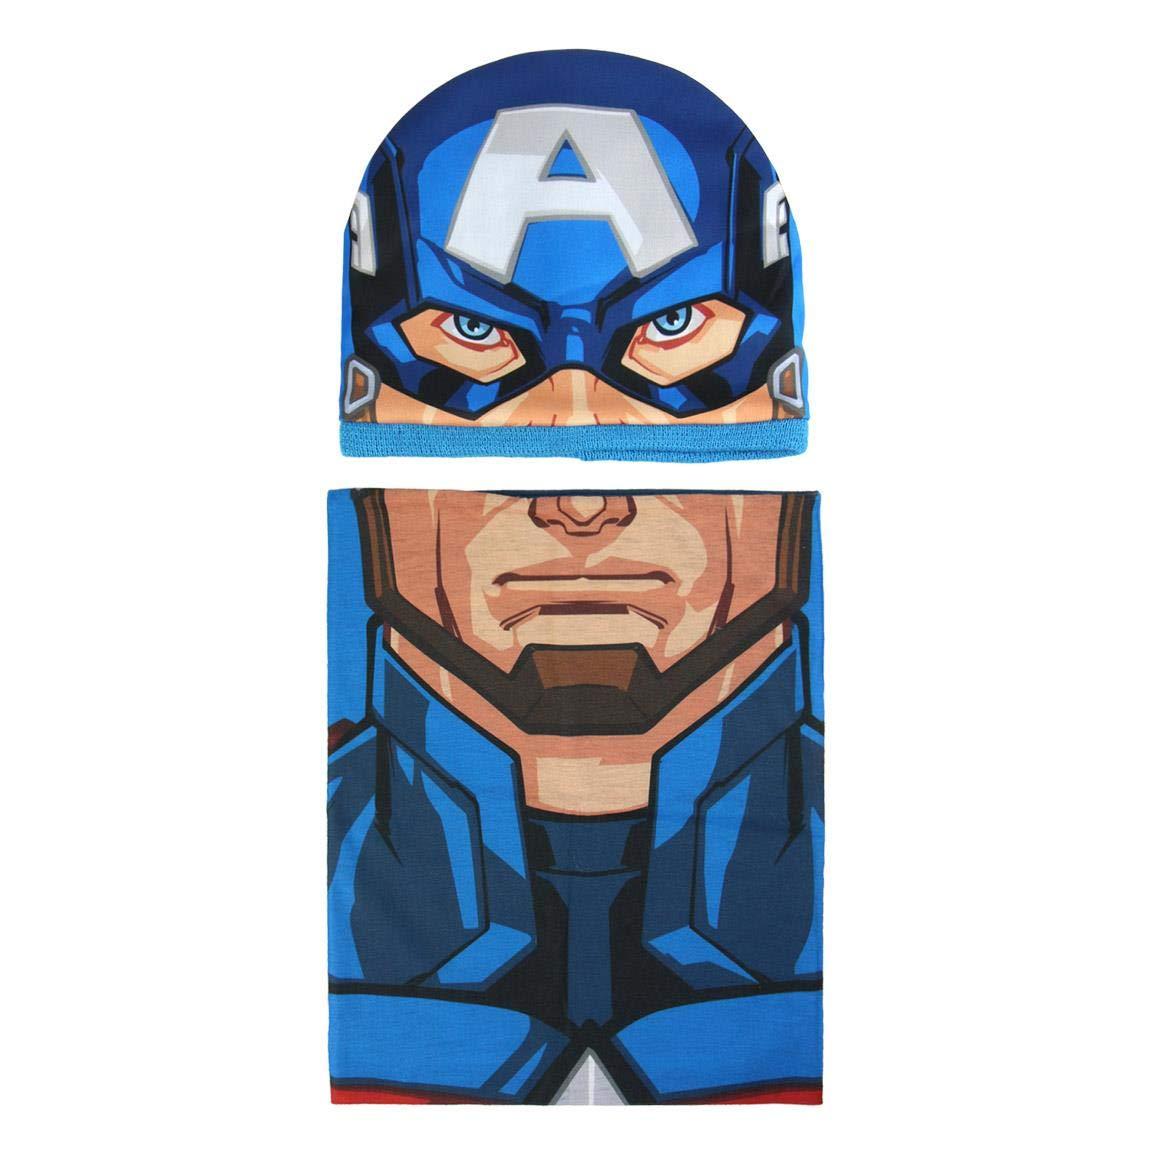 Cerdá Boy's Conjunto 2 Piezas Avengers Capitan America Scarf, Hat and Glove Set, Blue (Azul 001), One Size (Manufacturer Size: Única) 2200003294